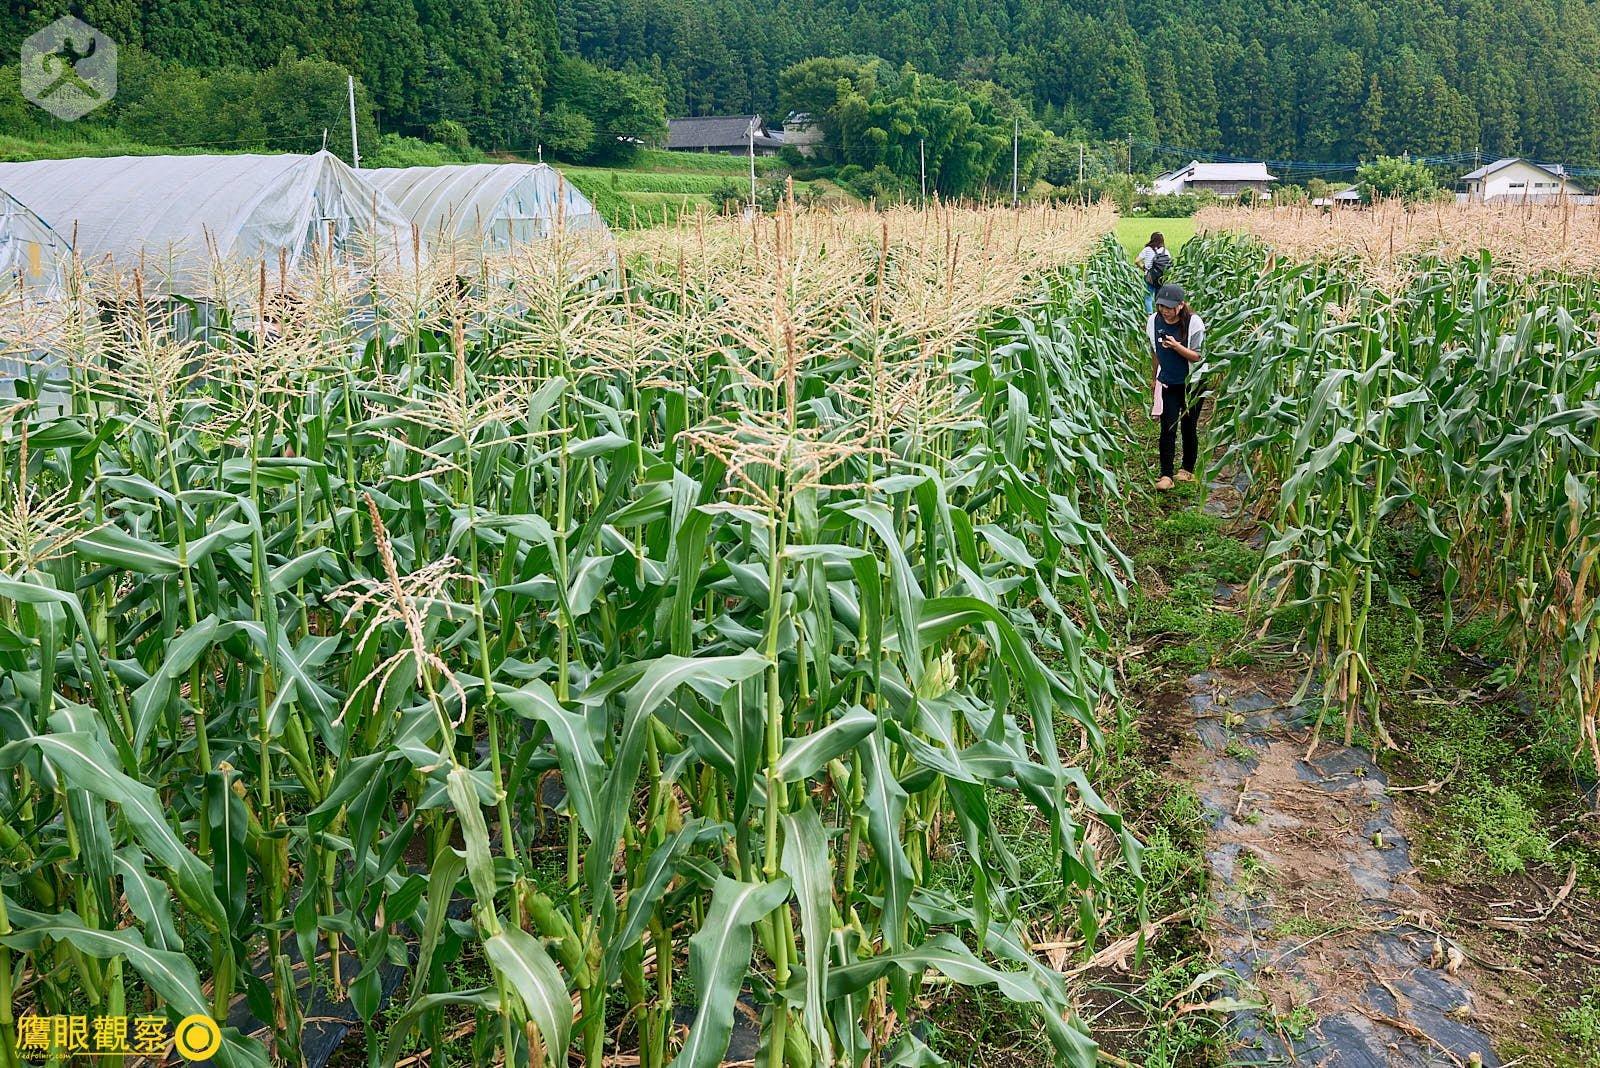 Japan Travel Corn field farmer 20190817134522 日本廢棄小學 🚗 RV 休旅車露營、森林探險之旅(櫪木縣鹿沼市立久我小學)🇯🇵⛺️